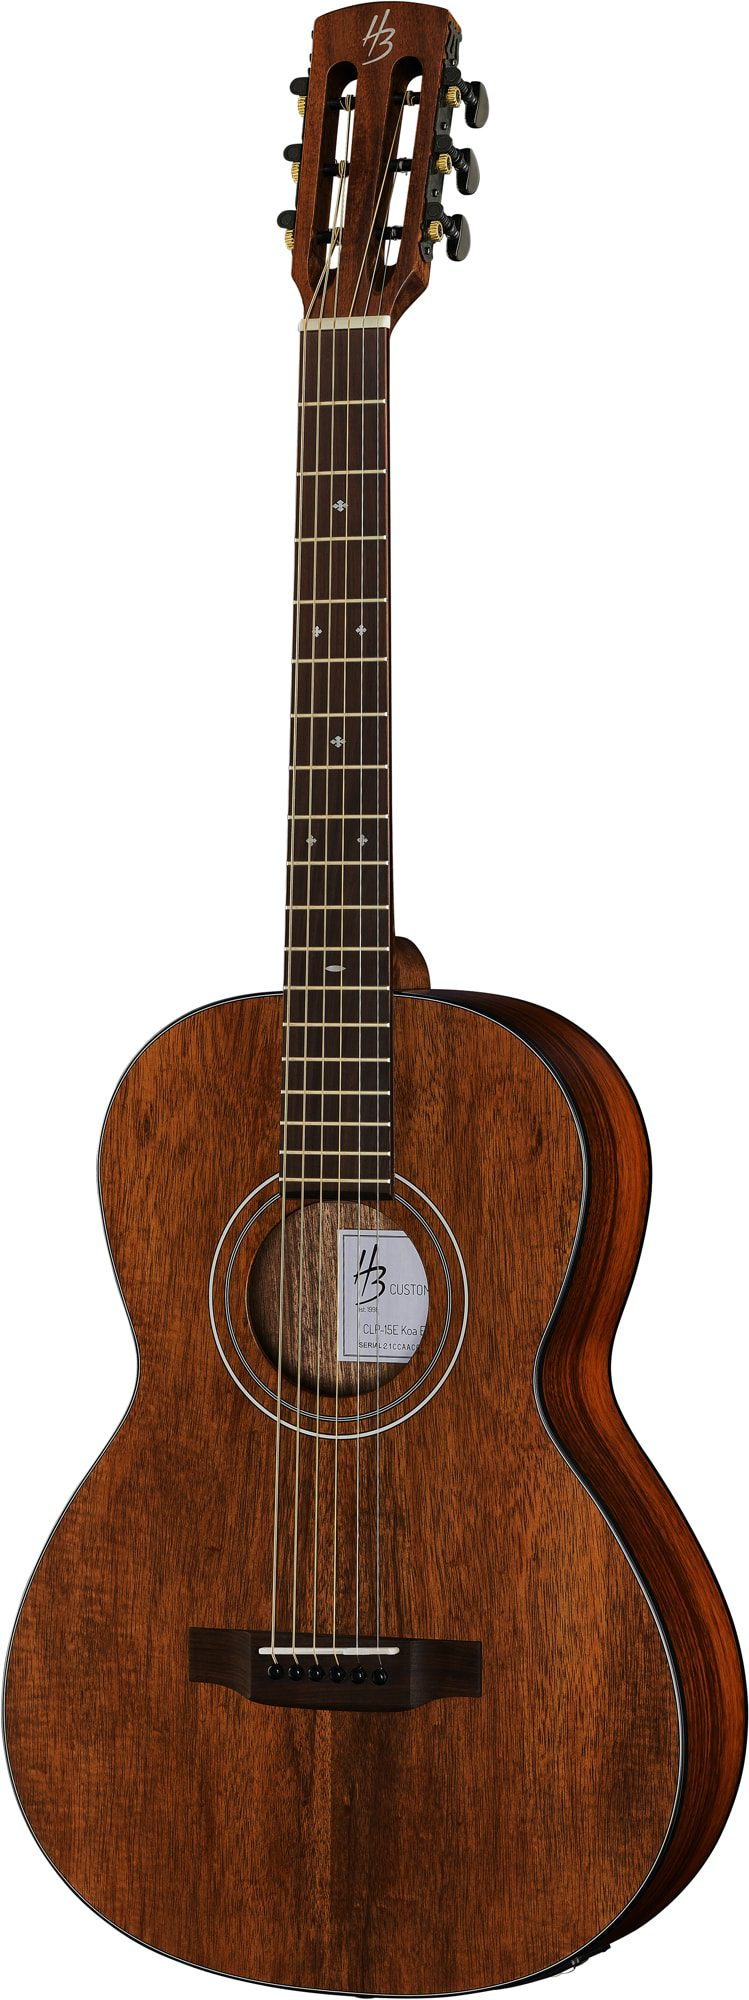 Harley Benton Exotic Wood Custom Line Koa top